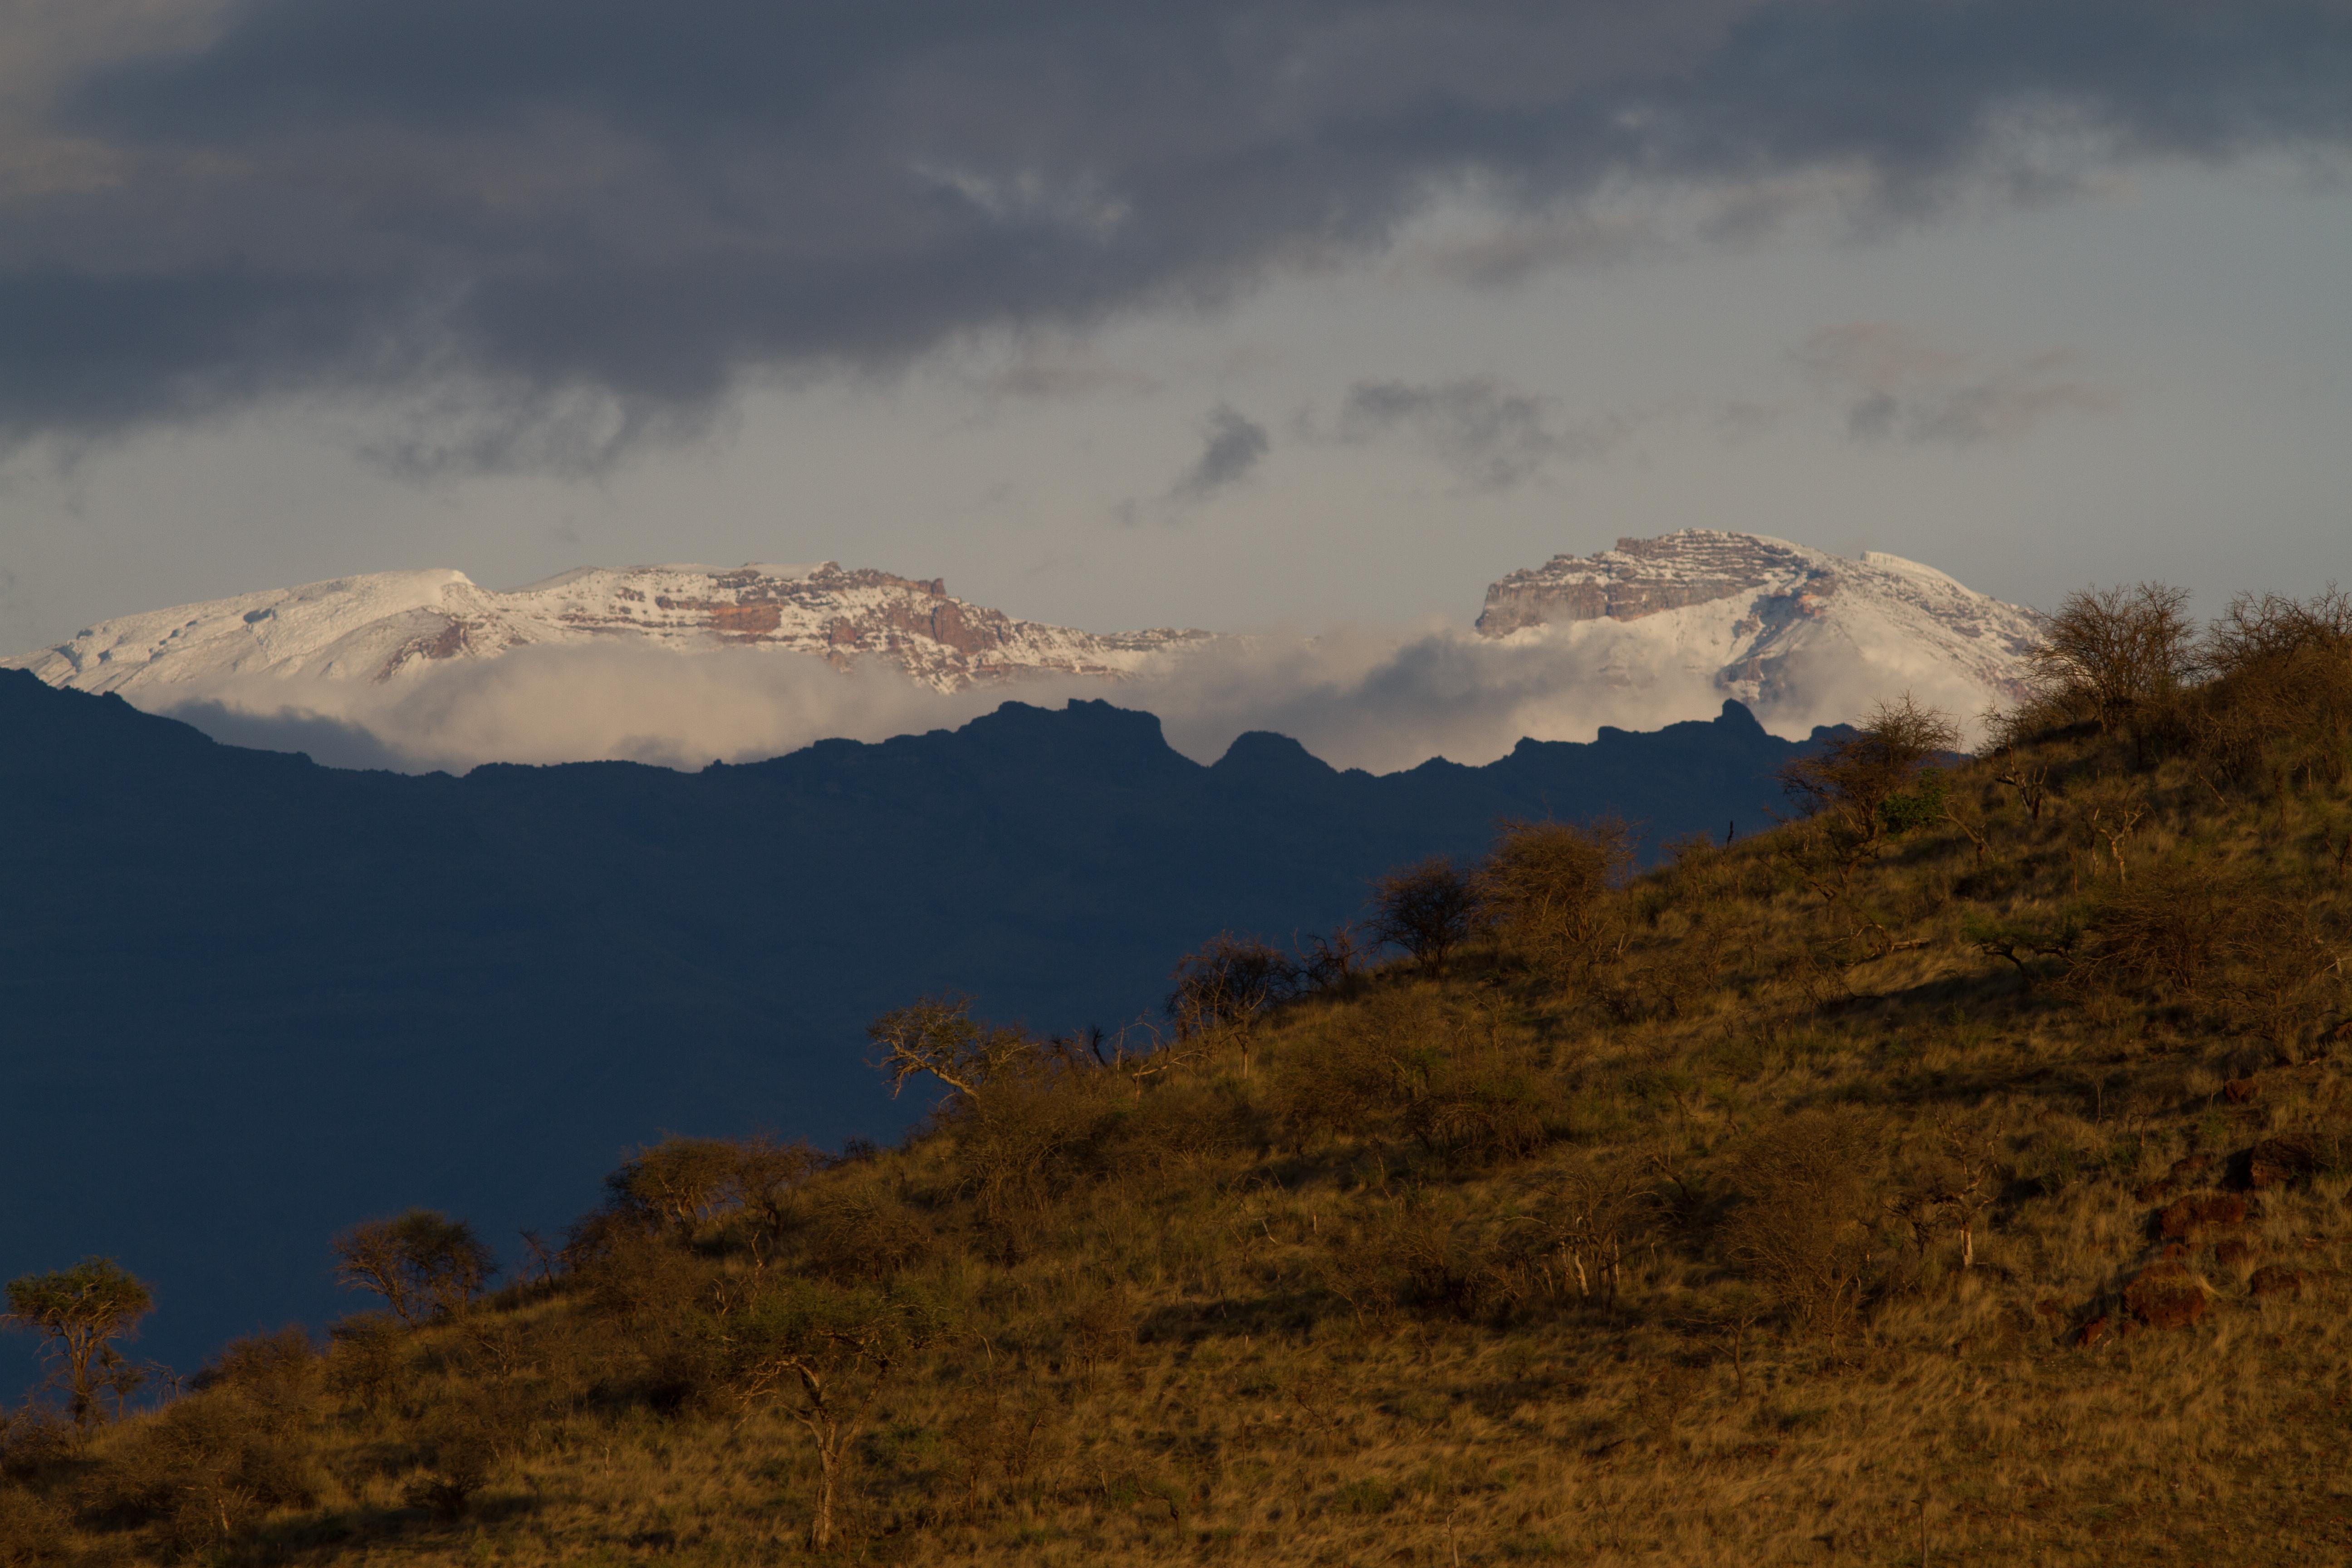 Kilimanjaro from Shira plateau